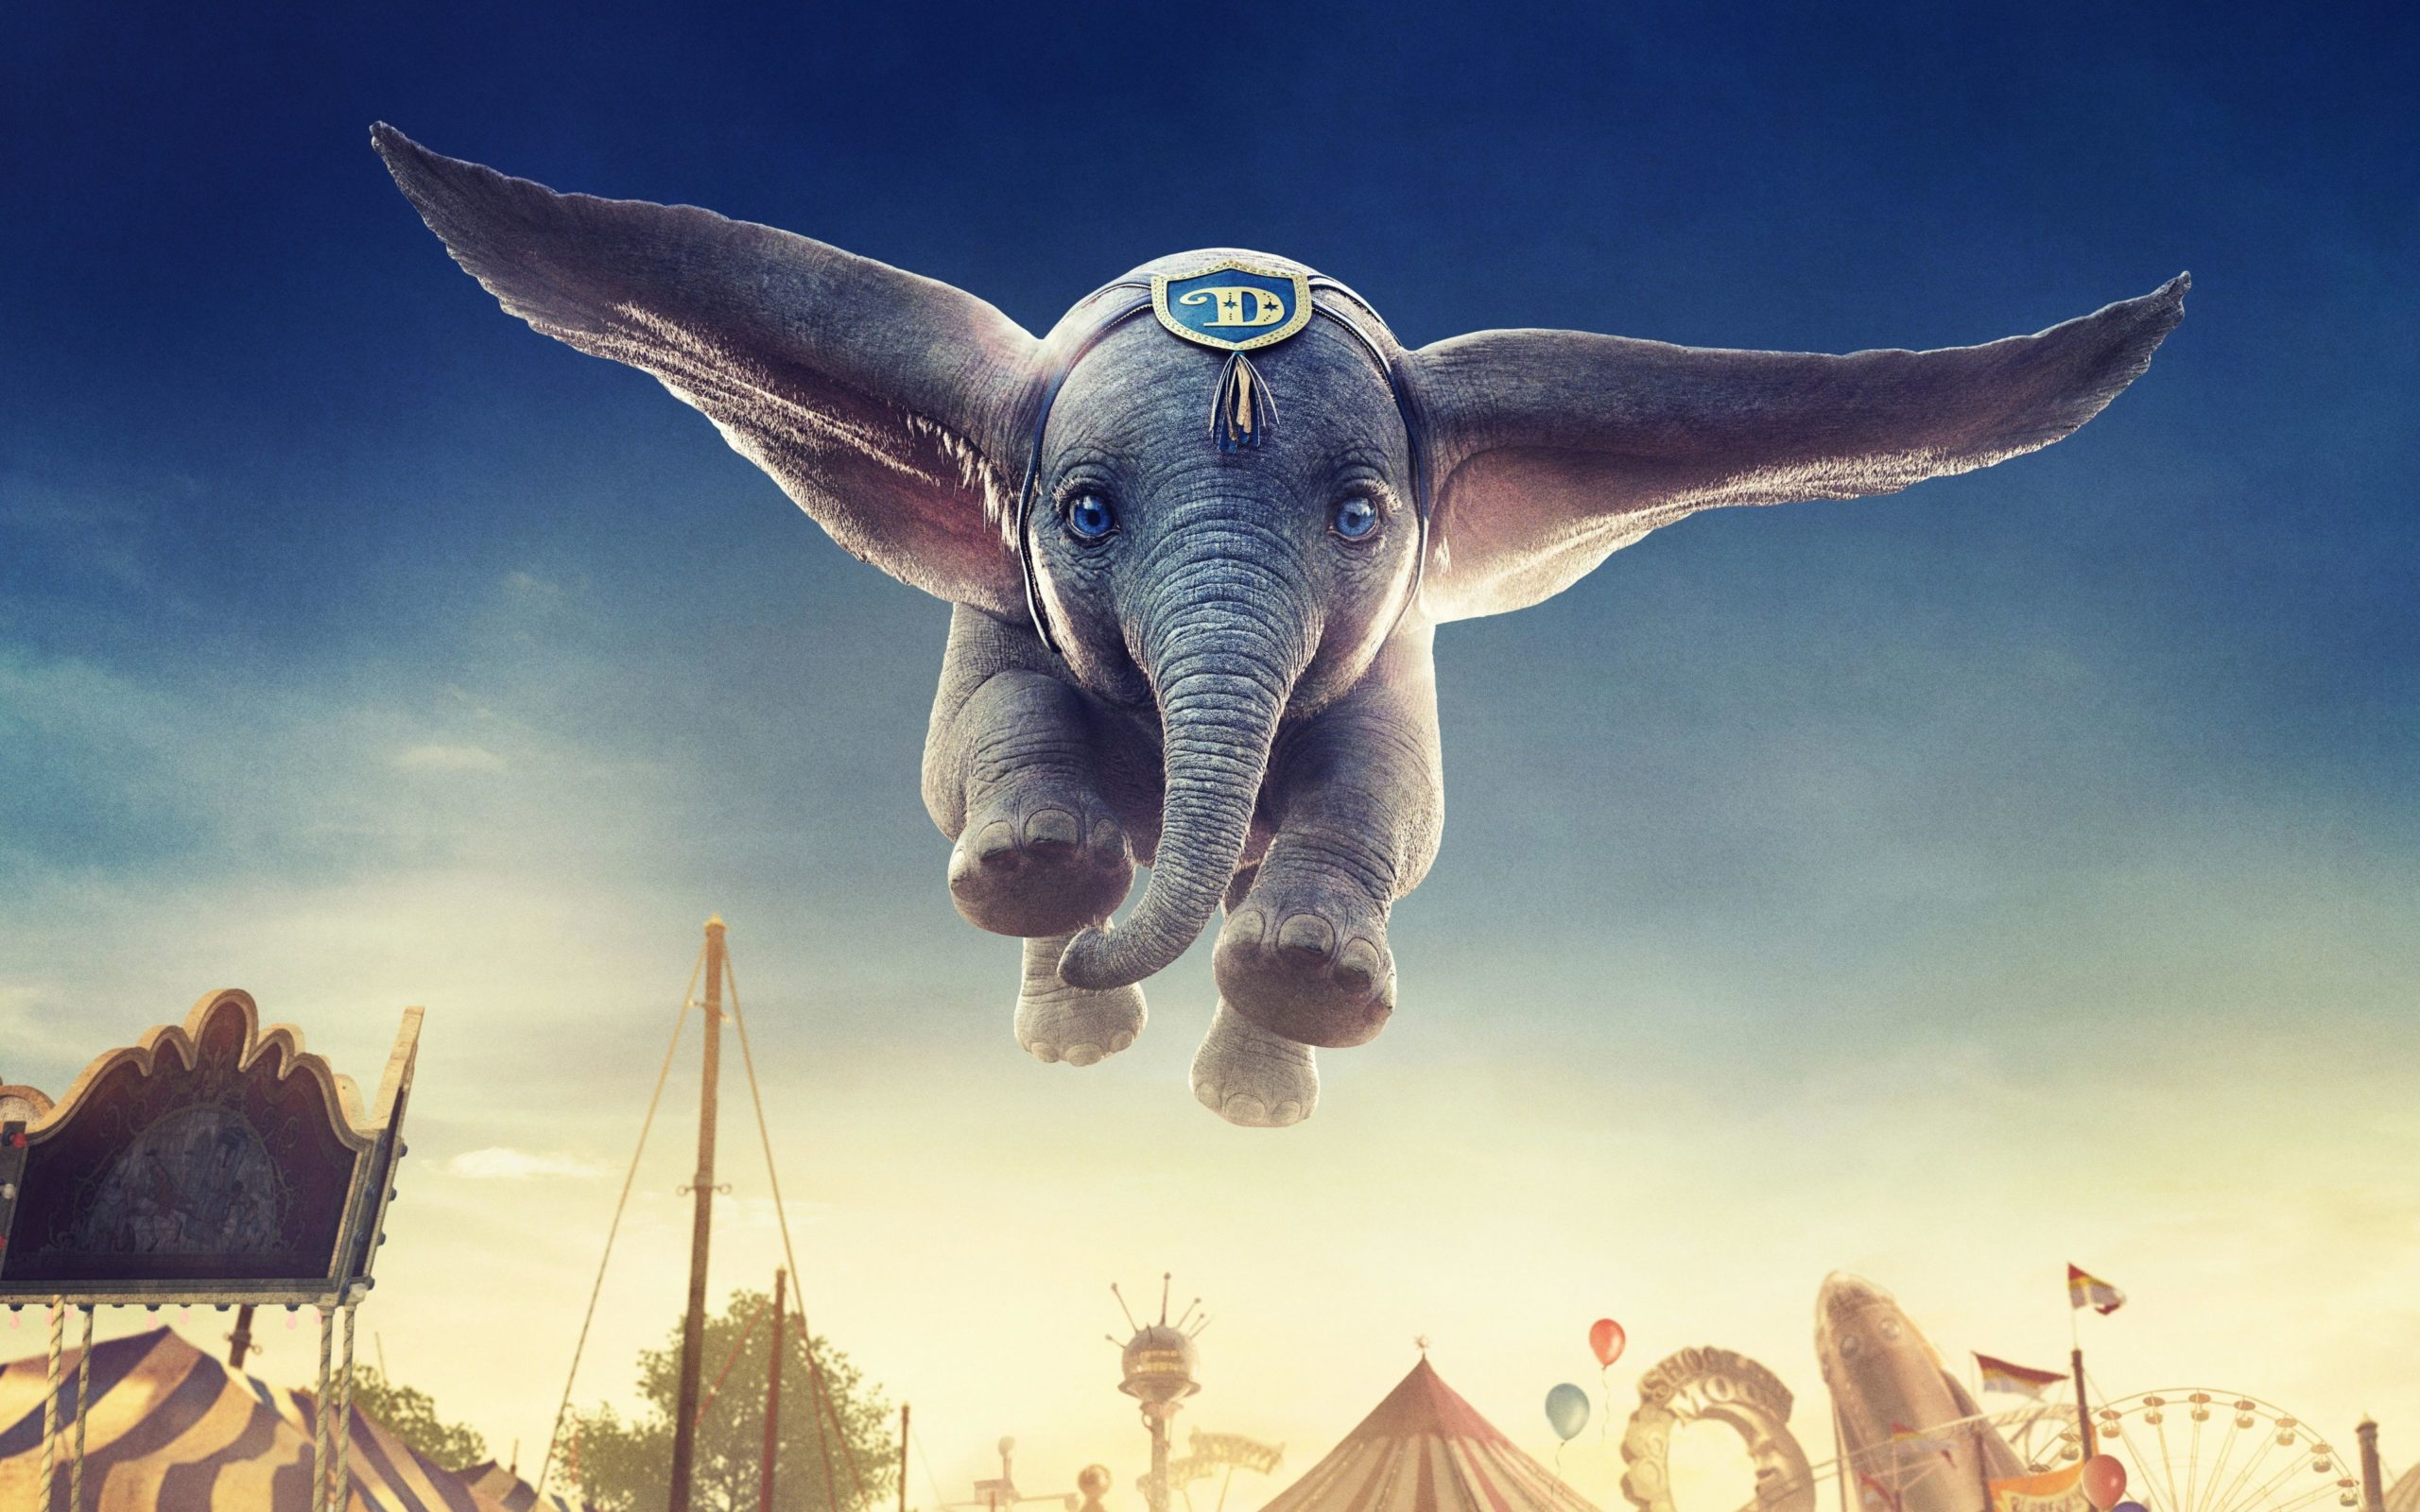 images of elephant